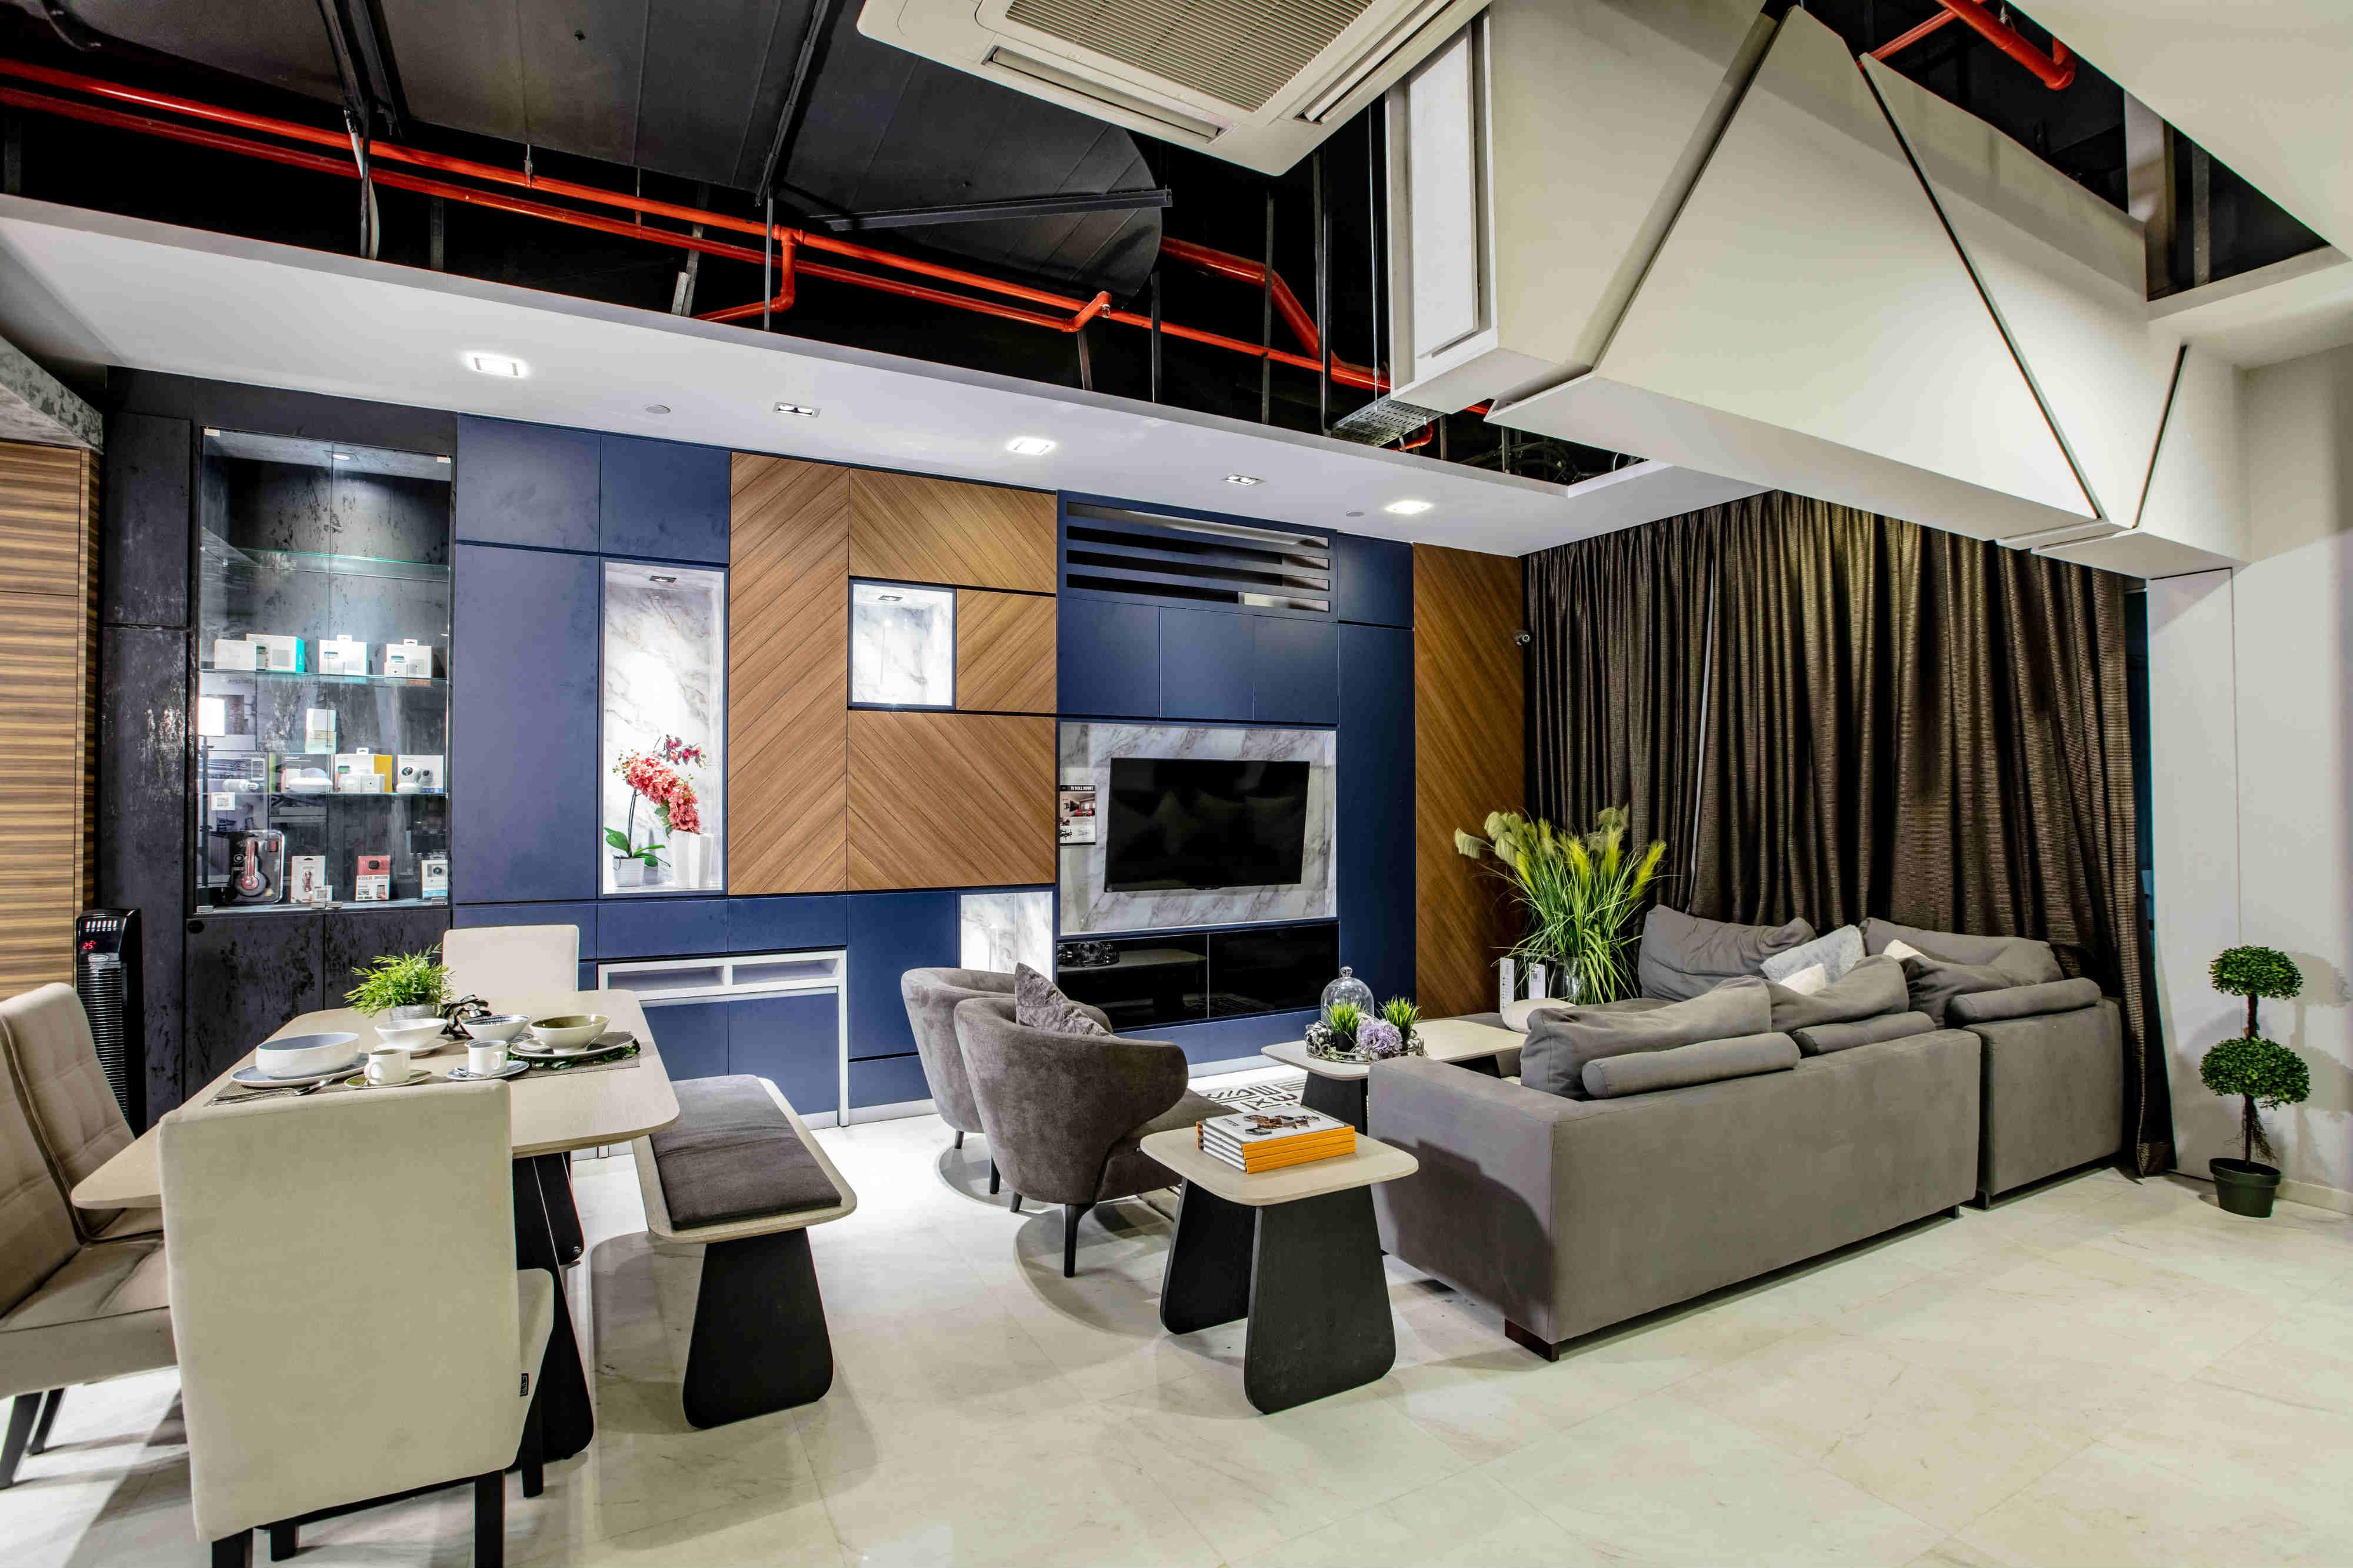 Interior design material resource library renovation for Interior design resources